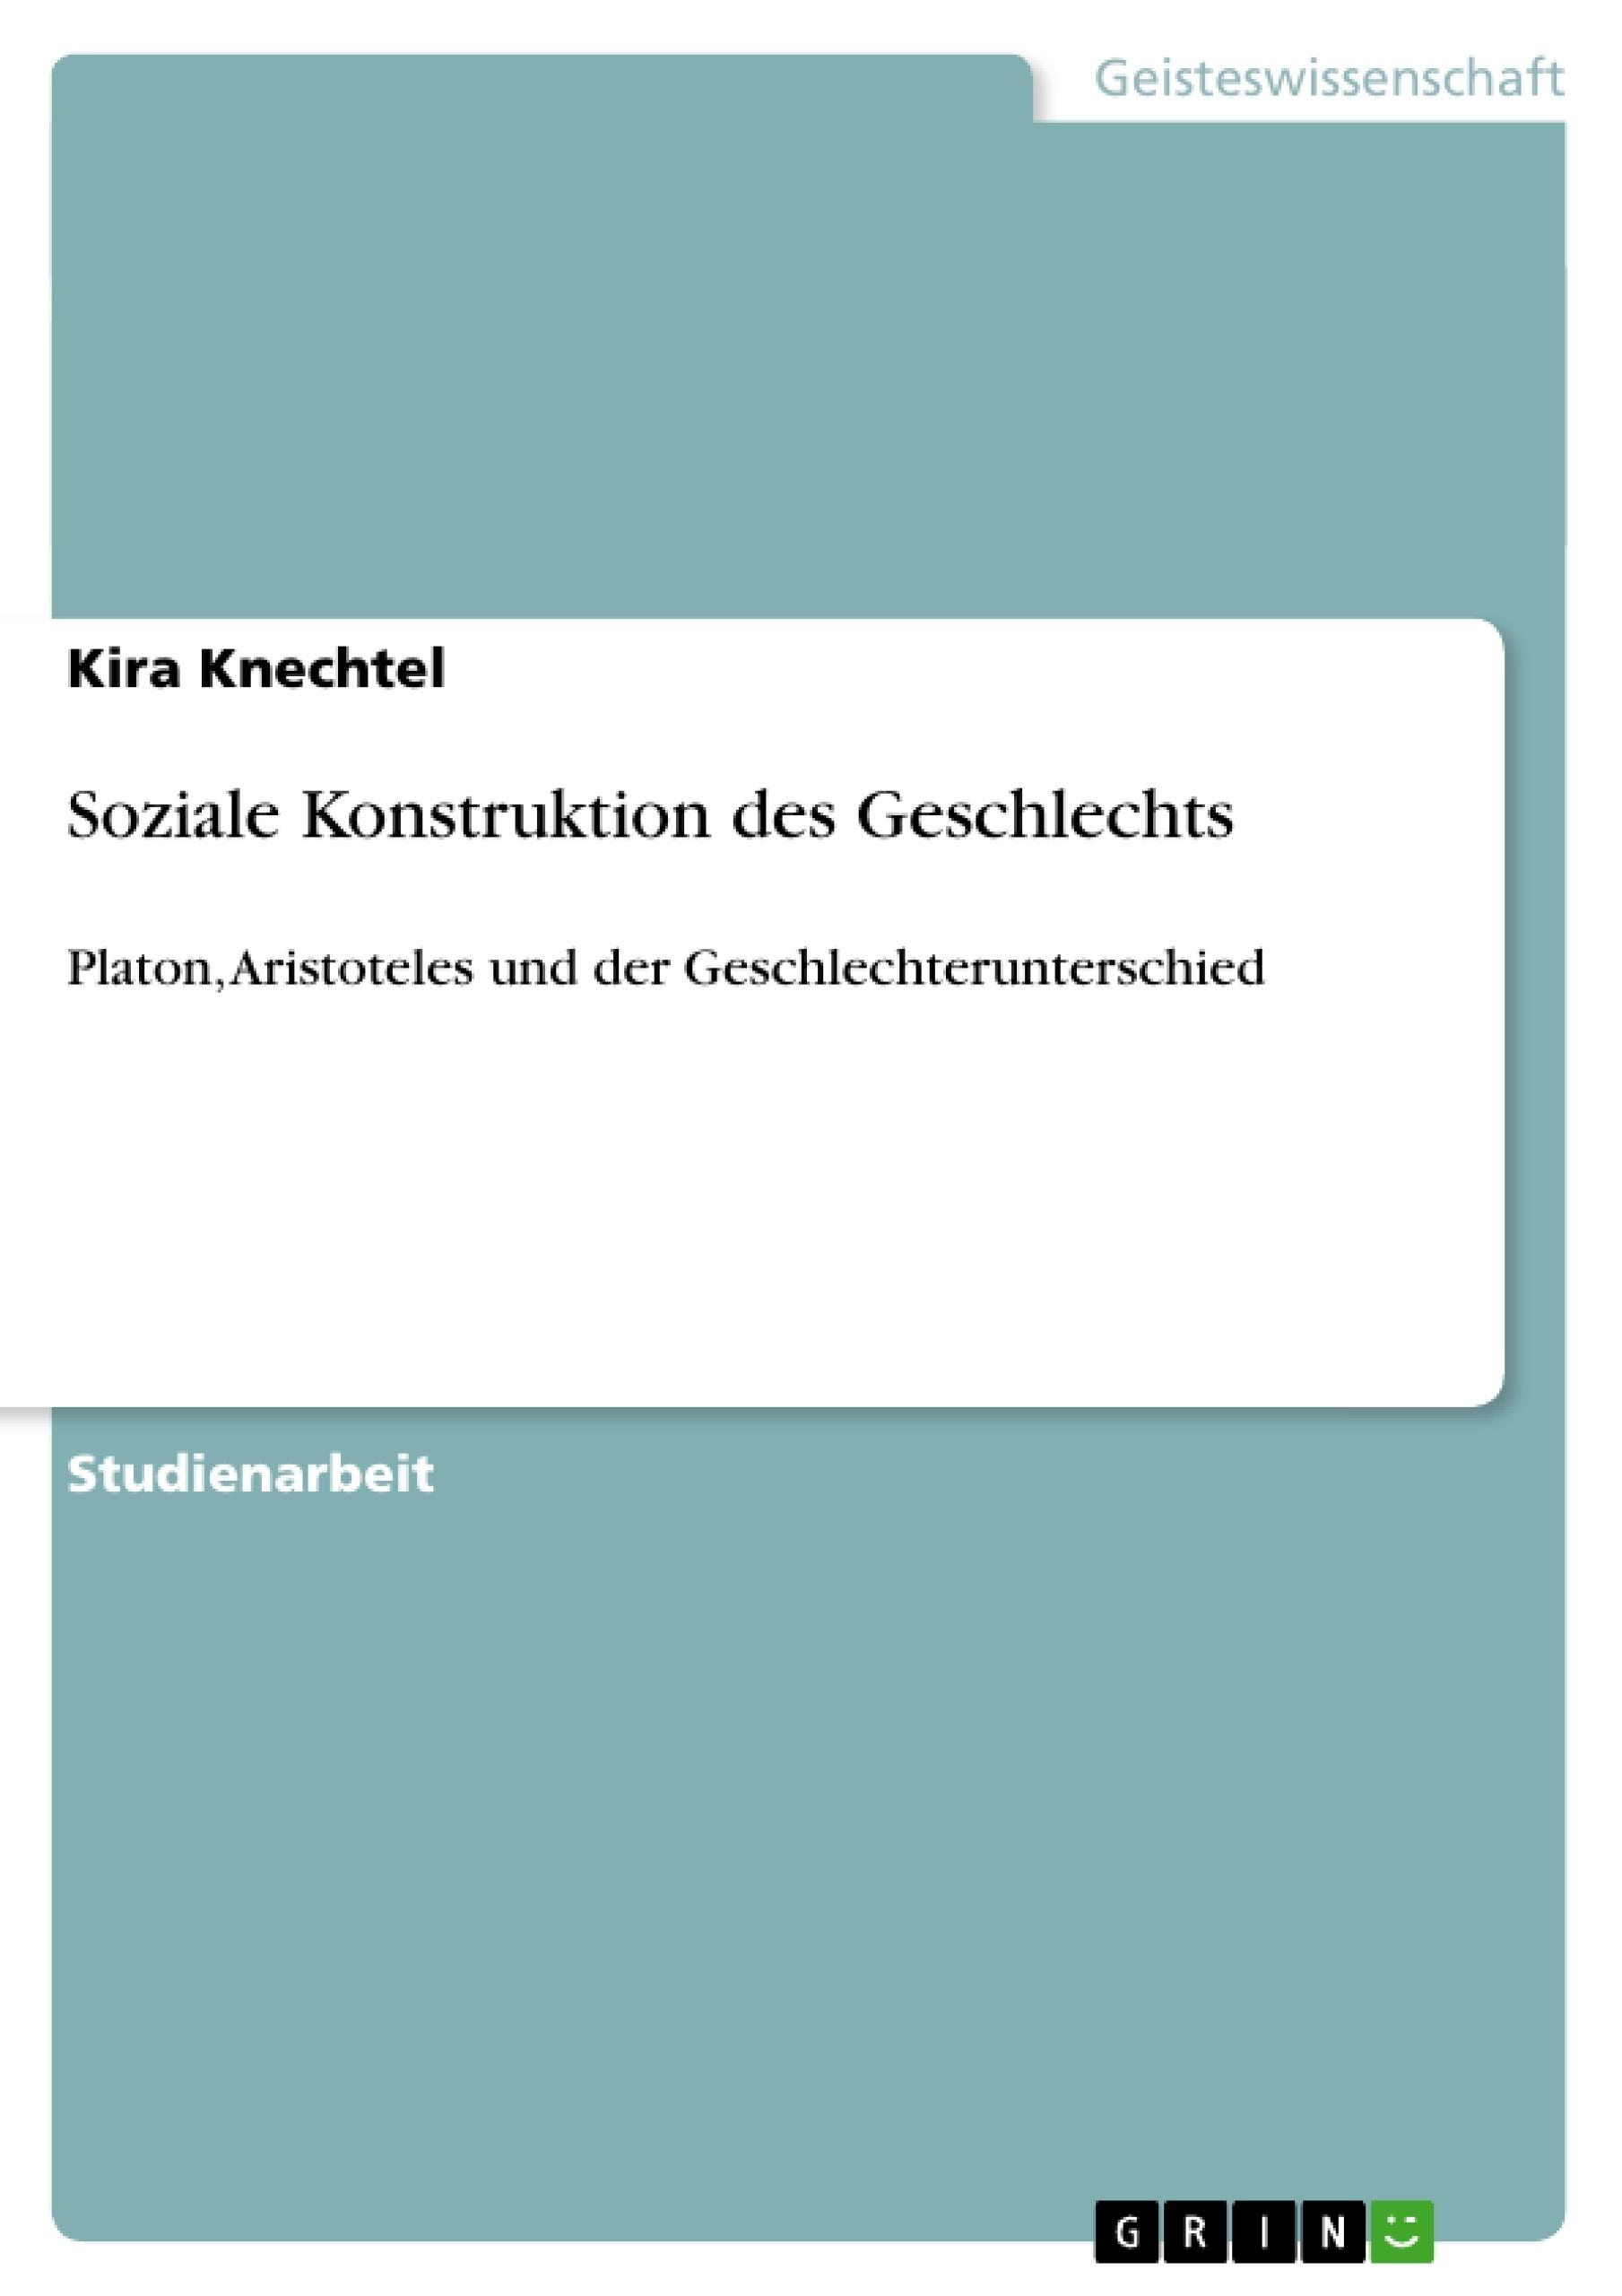 Titel: Soziale Konstruktion des Geschlechts